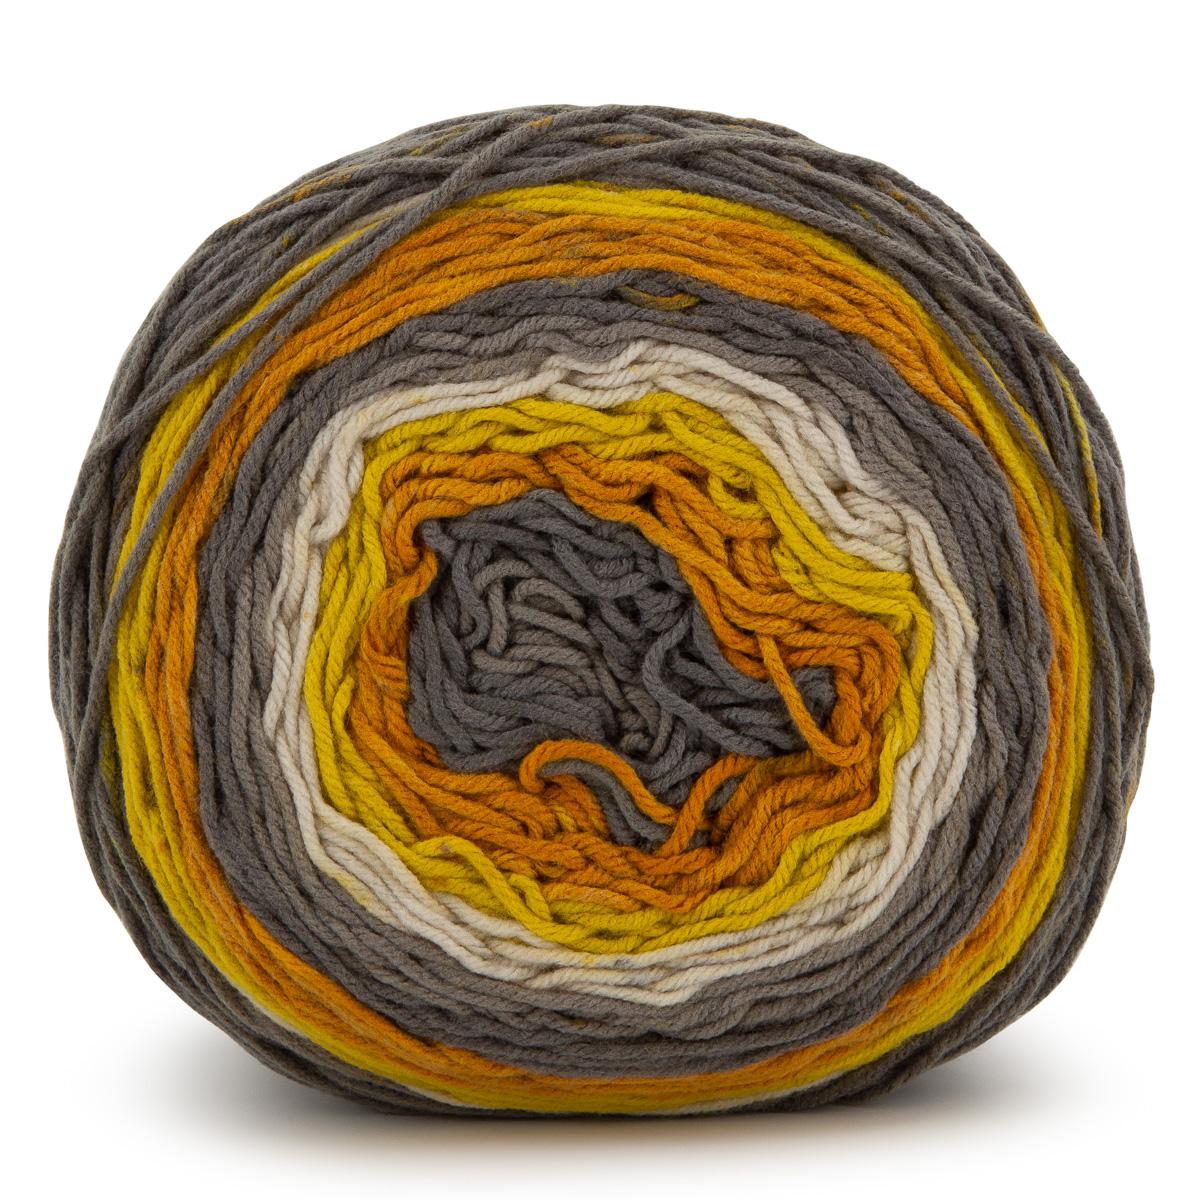 Caron-Big-Cakes-100-Acrylic-Worsted-Striping-Yarn-Medium-4-Cake-Knit-Crochet thumbnail 14